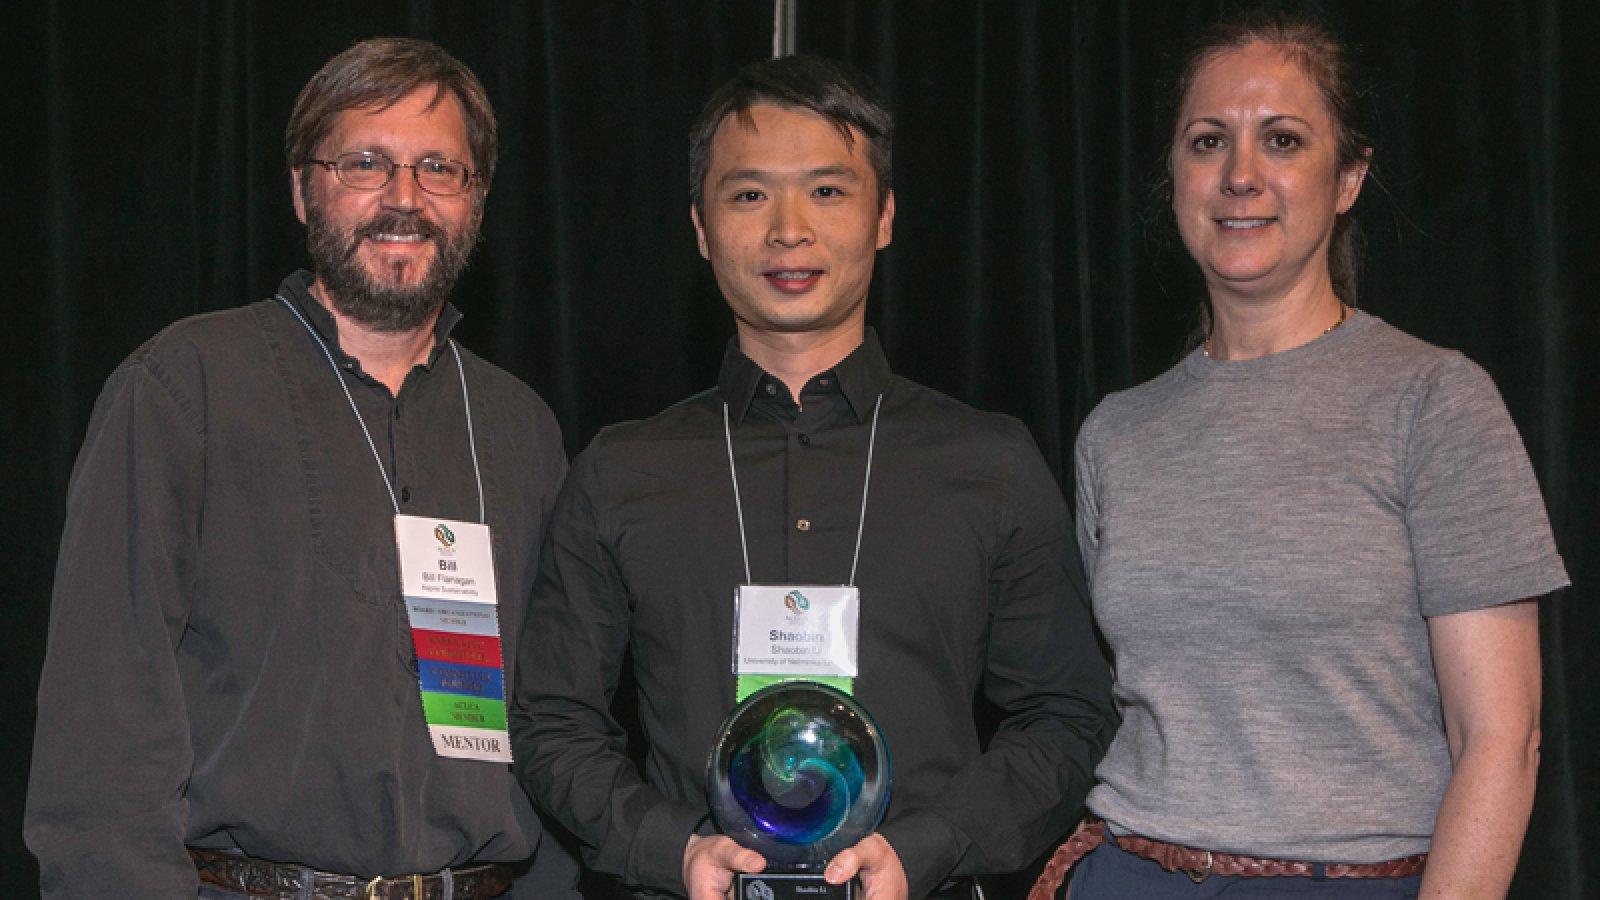 Left to Right: Bill Flanagan, ACLCA chair; Shaobin Li, Civil Engineering PhD Student; Debbie Steckel, ACLCA Executive Director